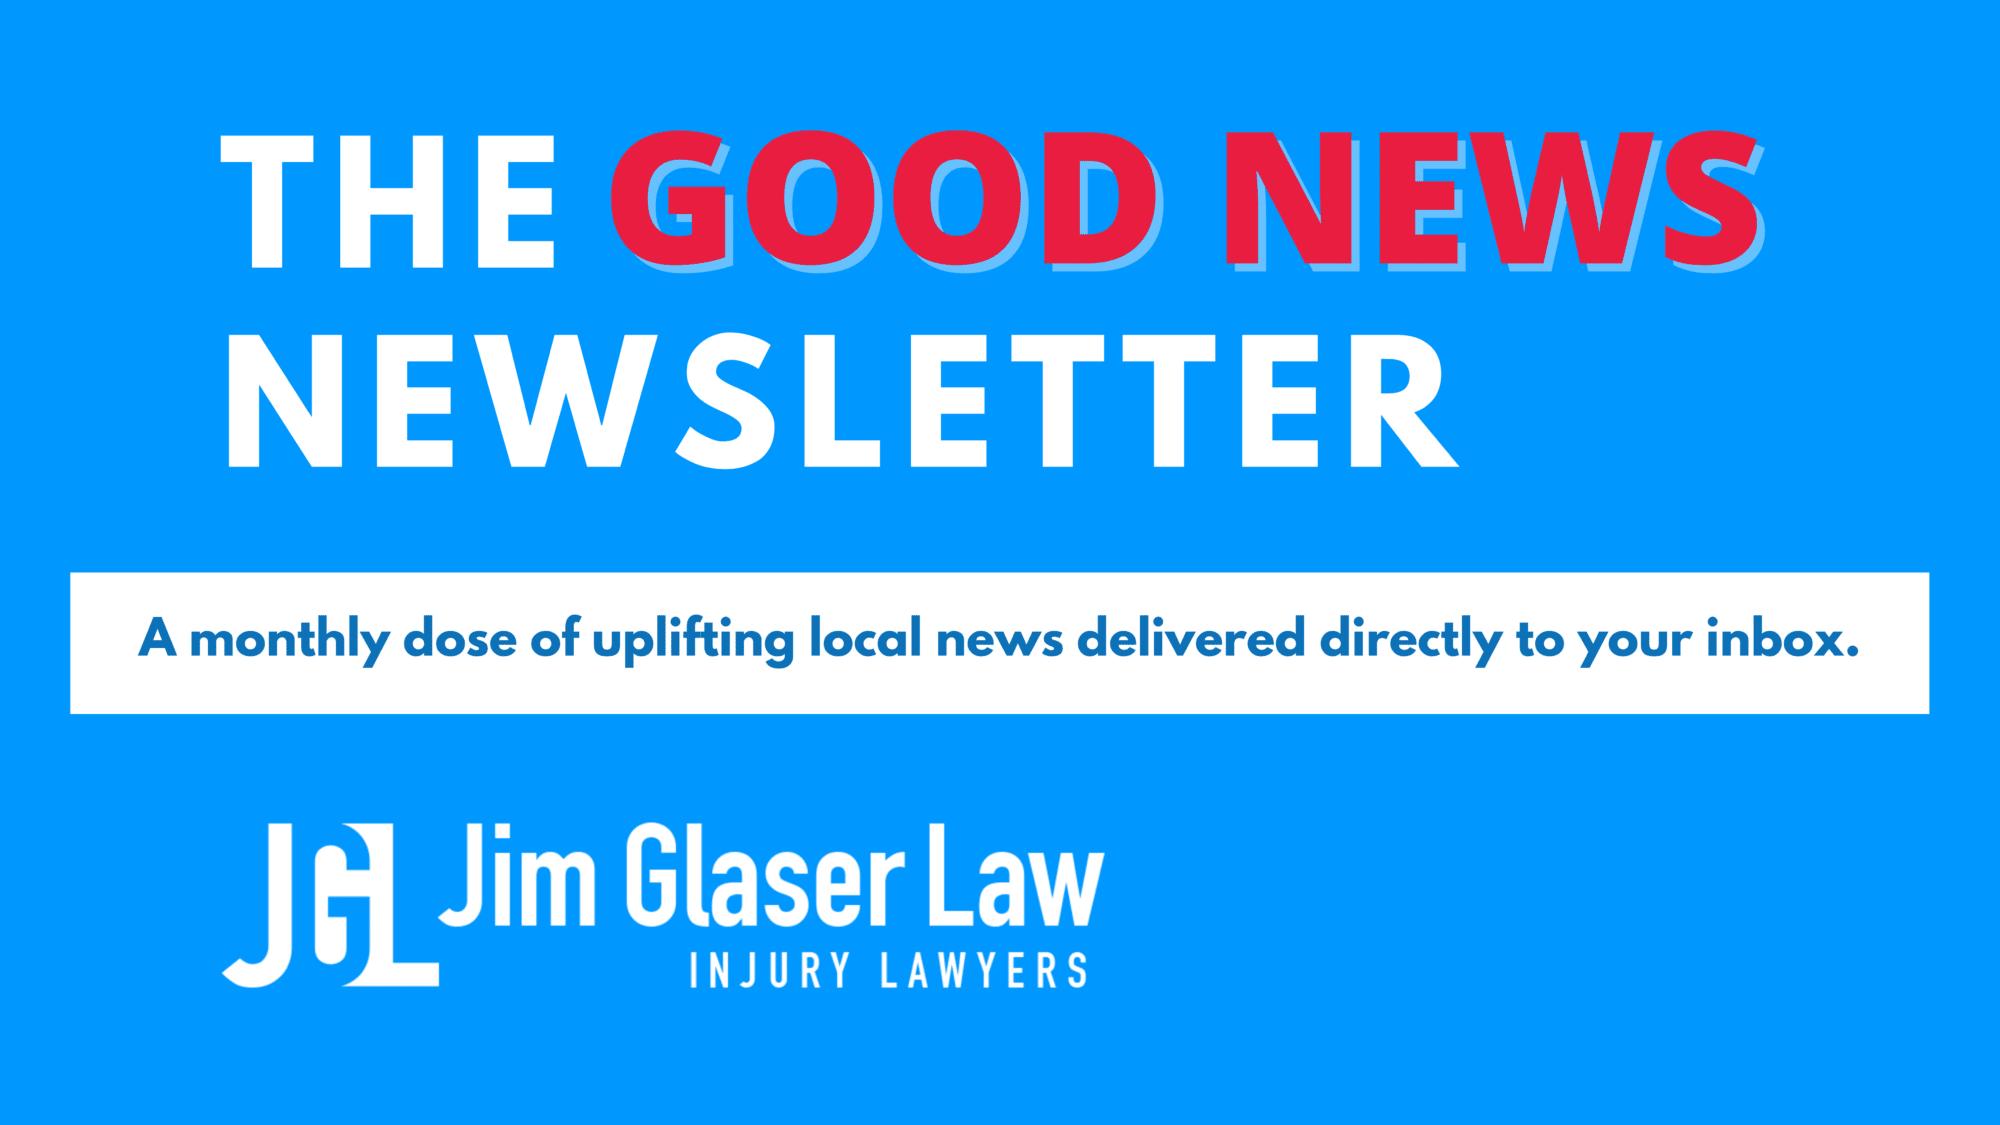 The Good News Newsletter